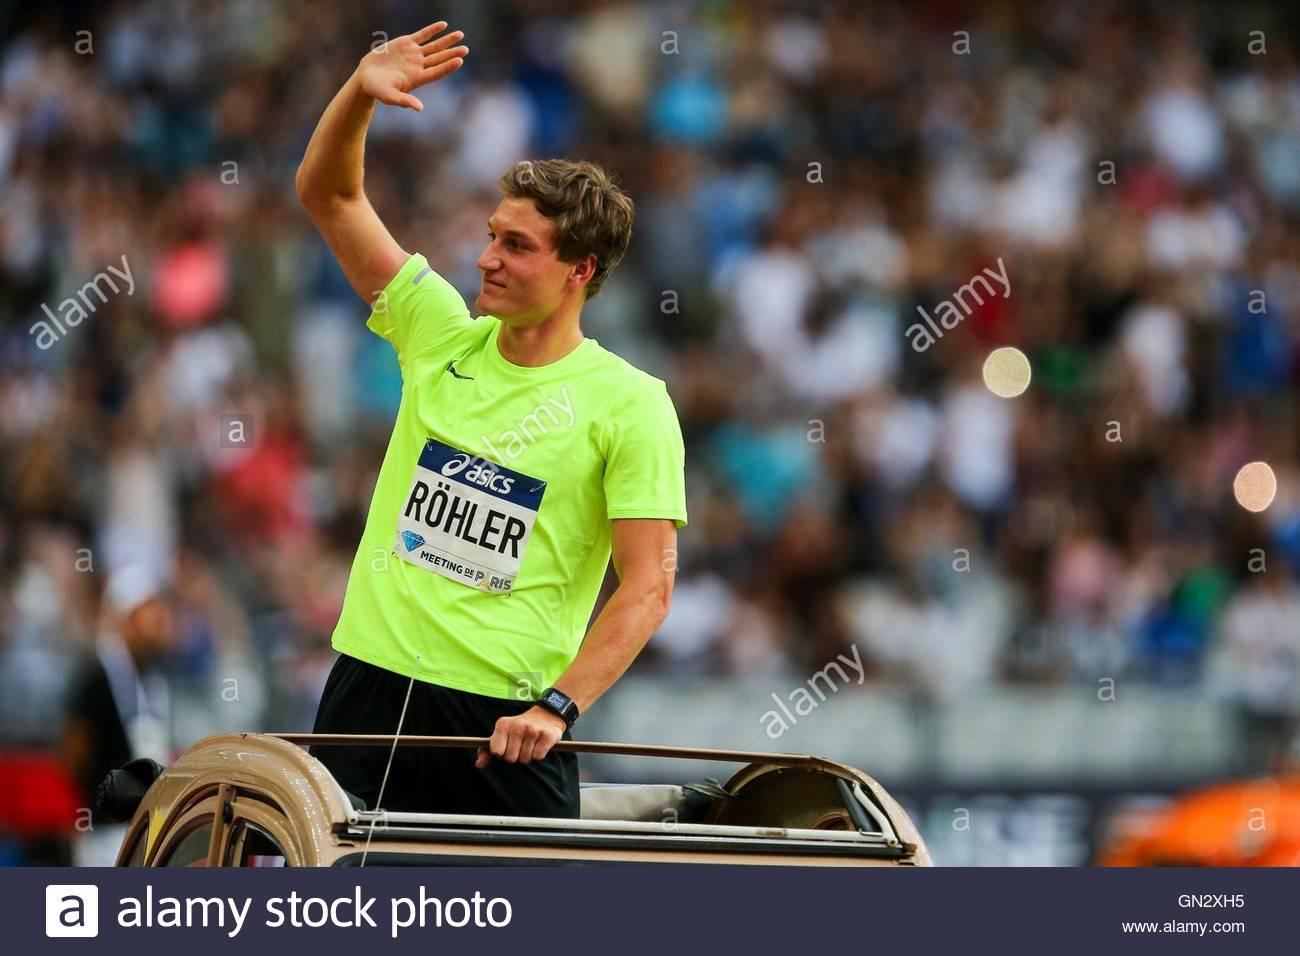 Saint Denis, France. 27th Aug, 2016. German javelin thrower Thomas Röhler parades in the Stade de France - Stock Image